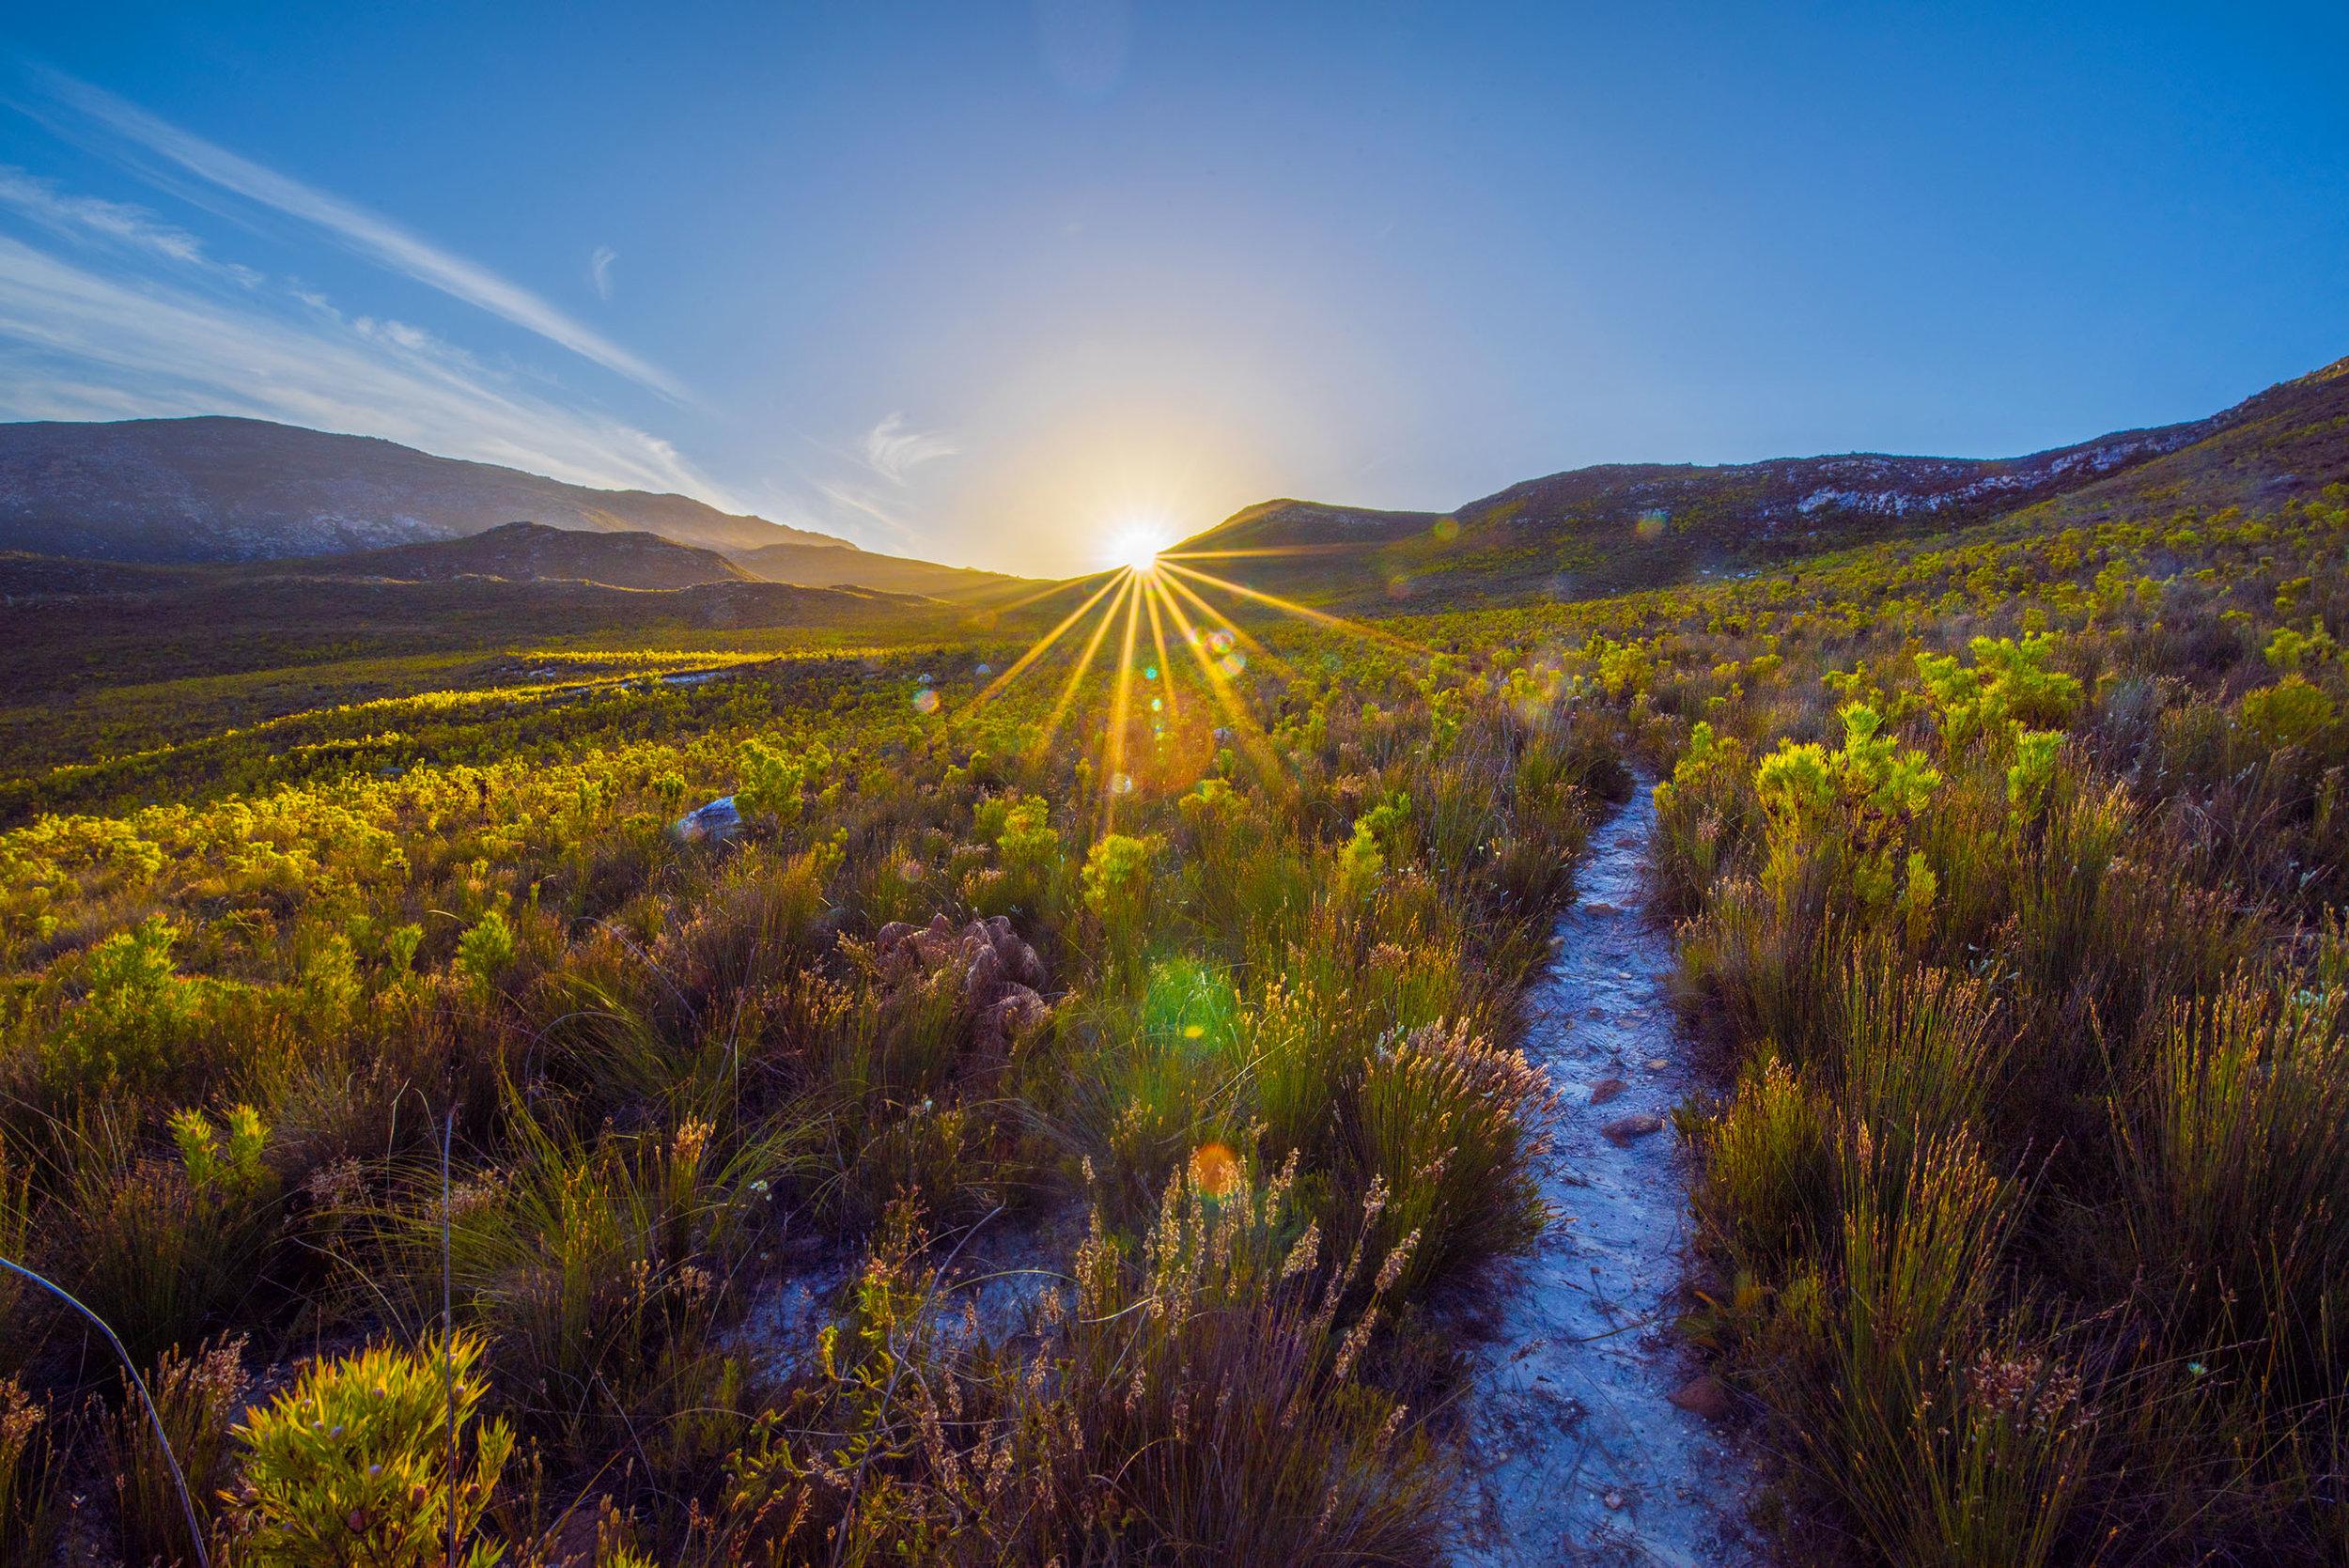 The fynbos, near Botrivier, South Africa